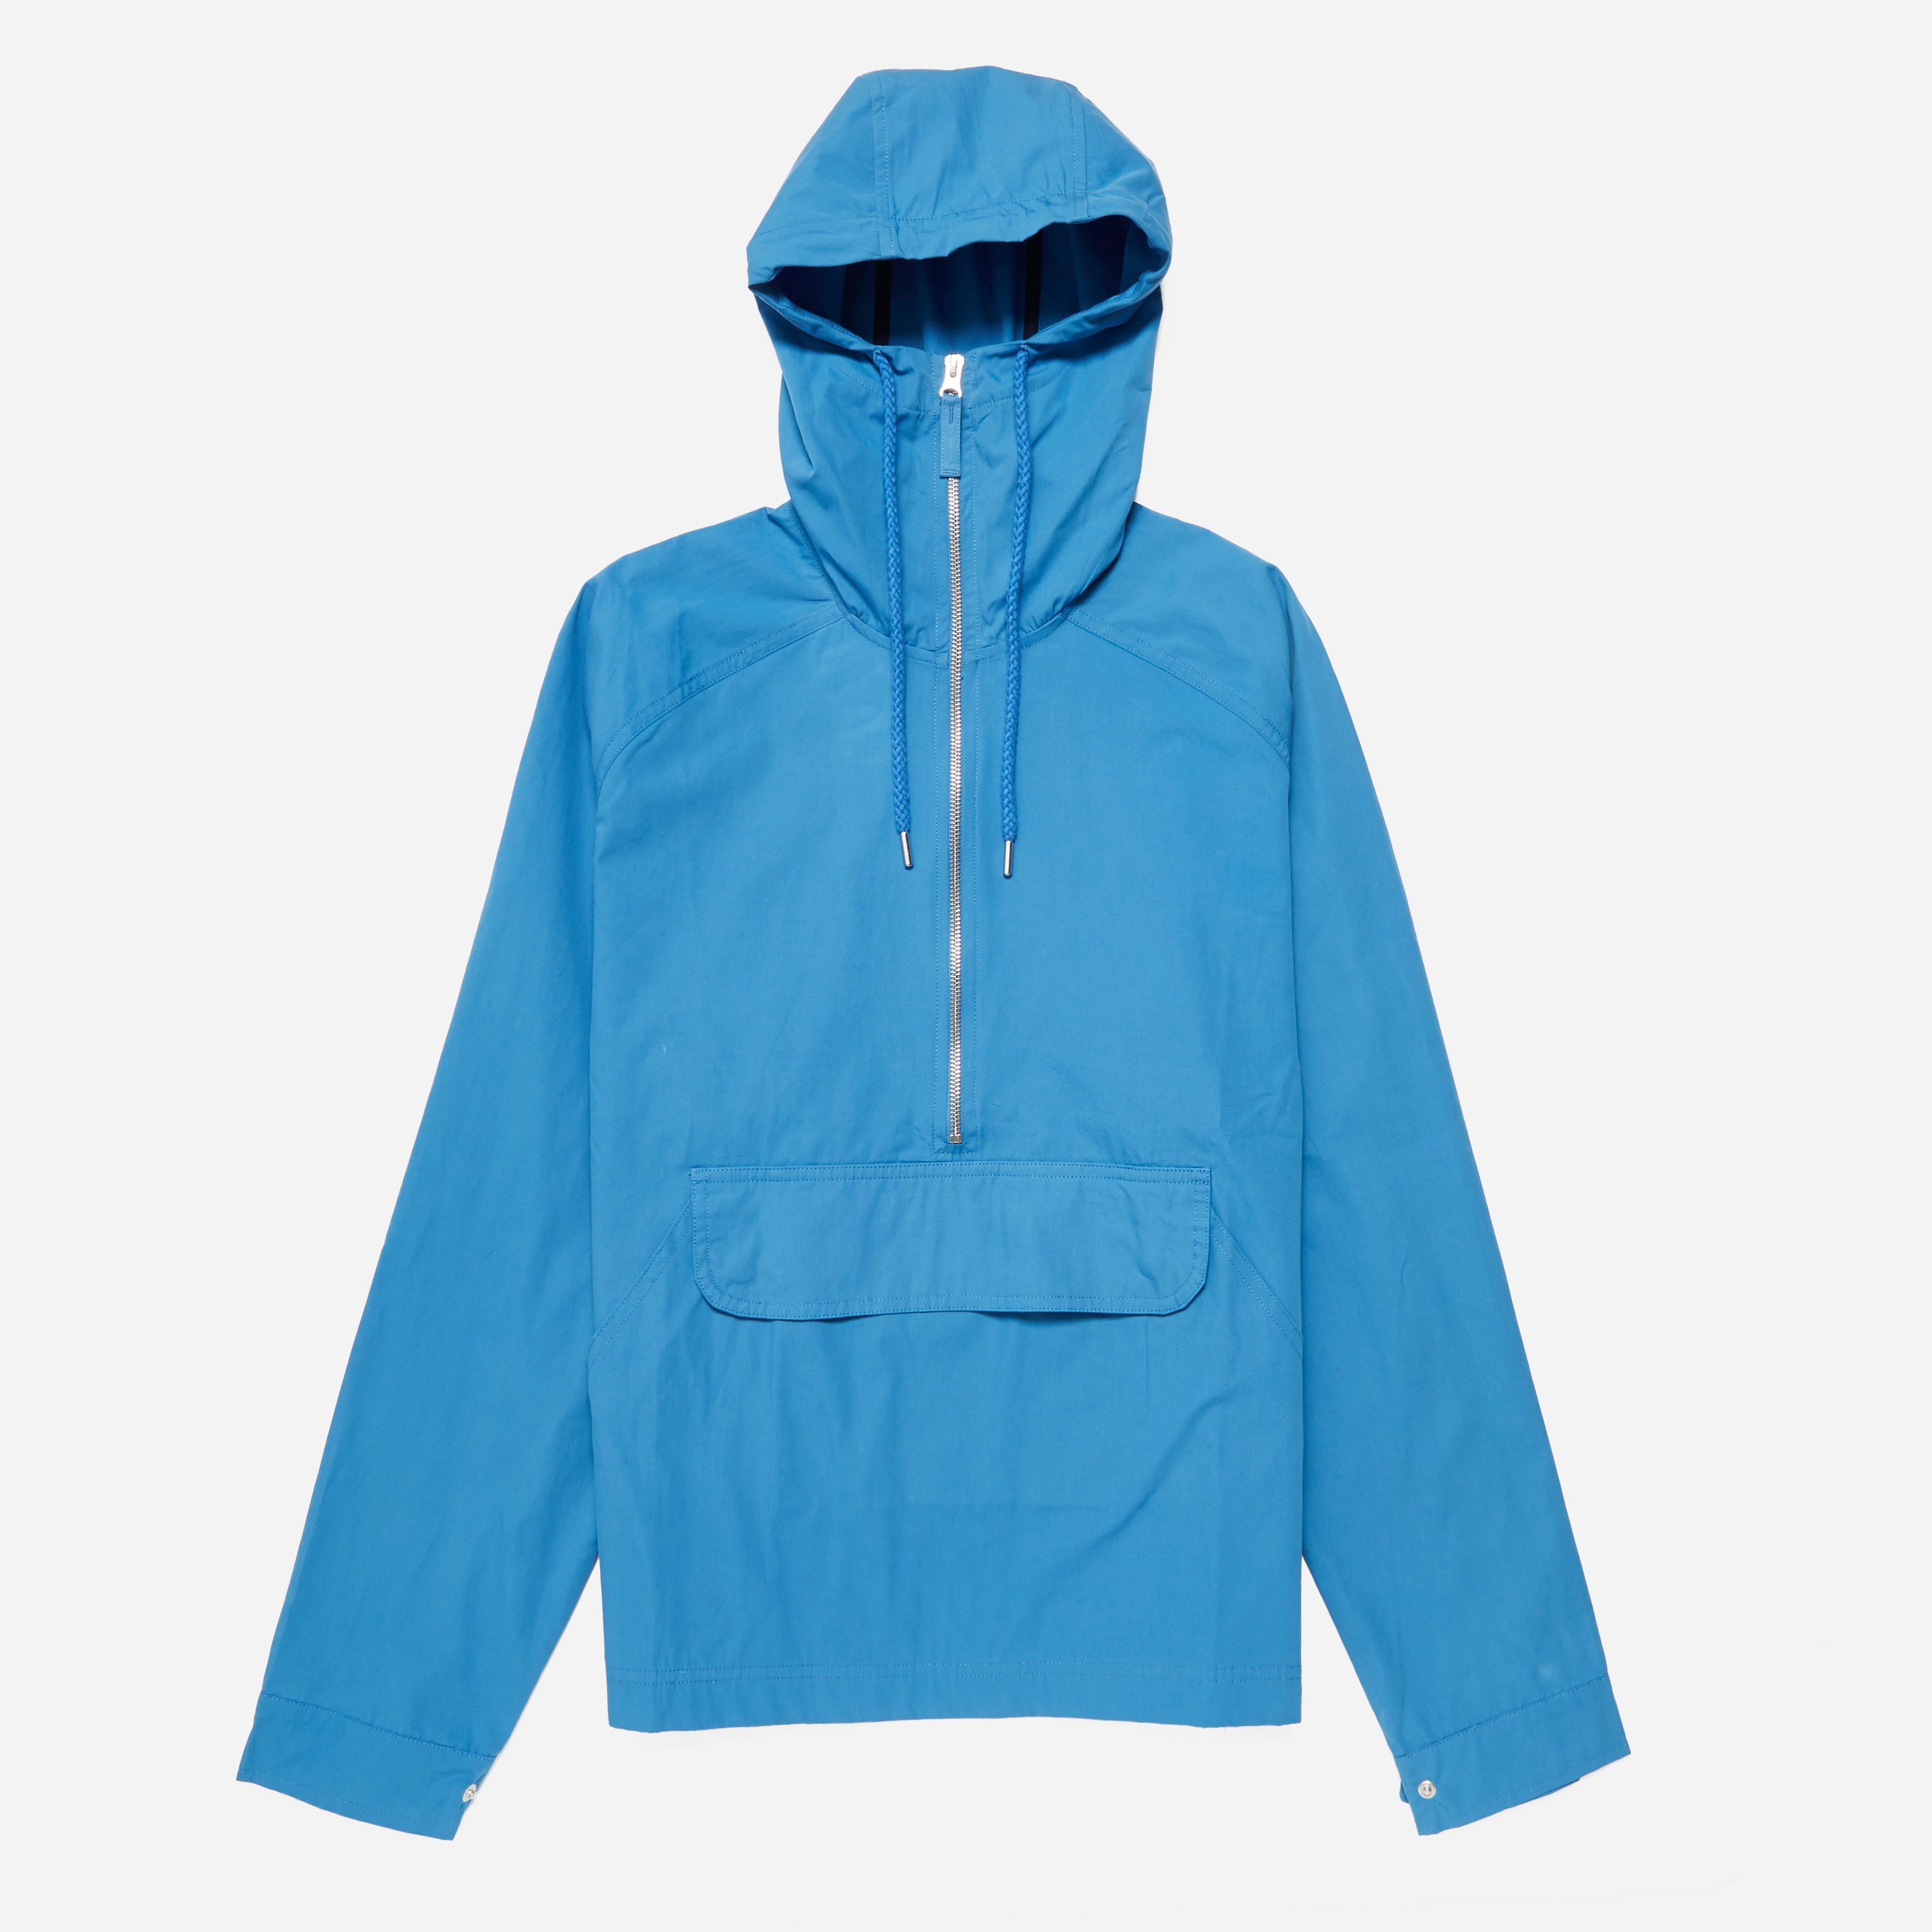 Pop Trading Company Drs Hooded Half Zip Jacket